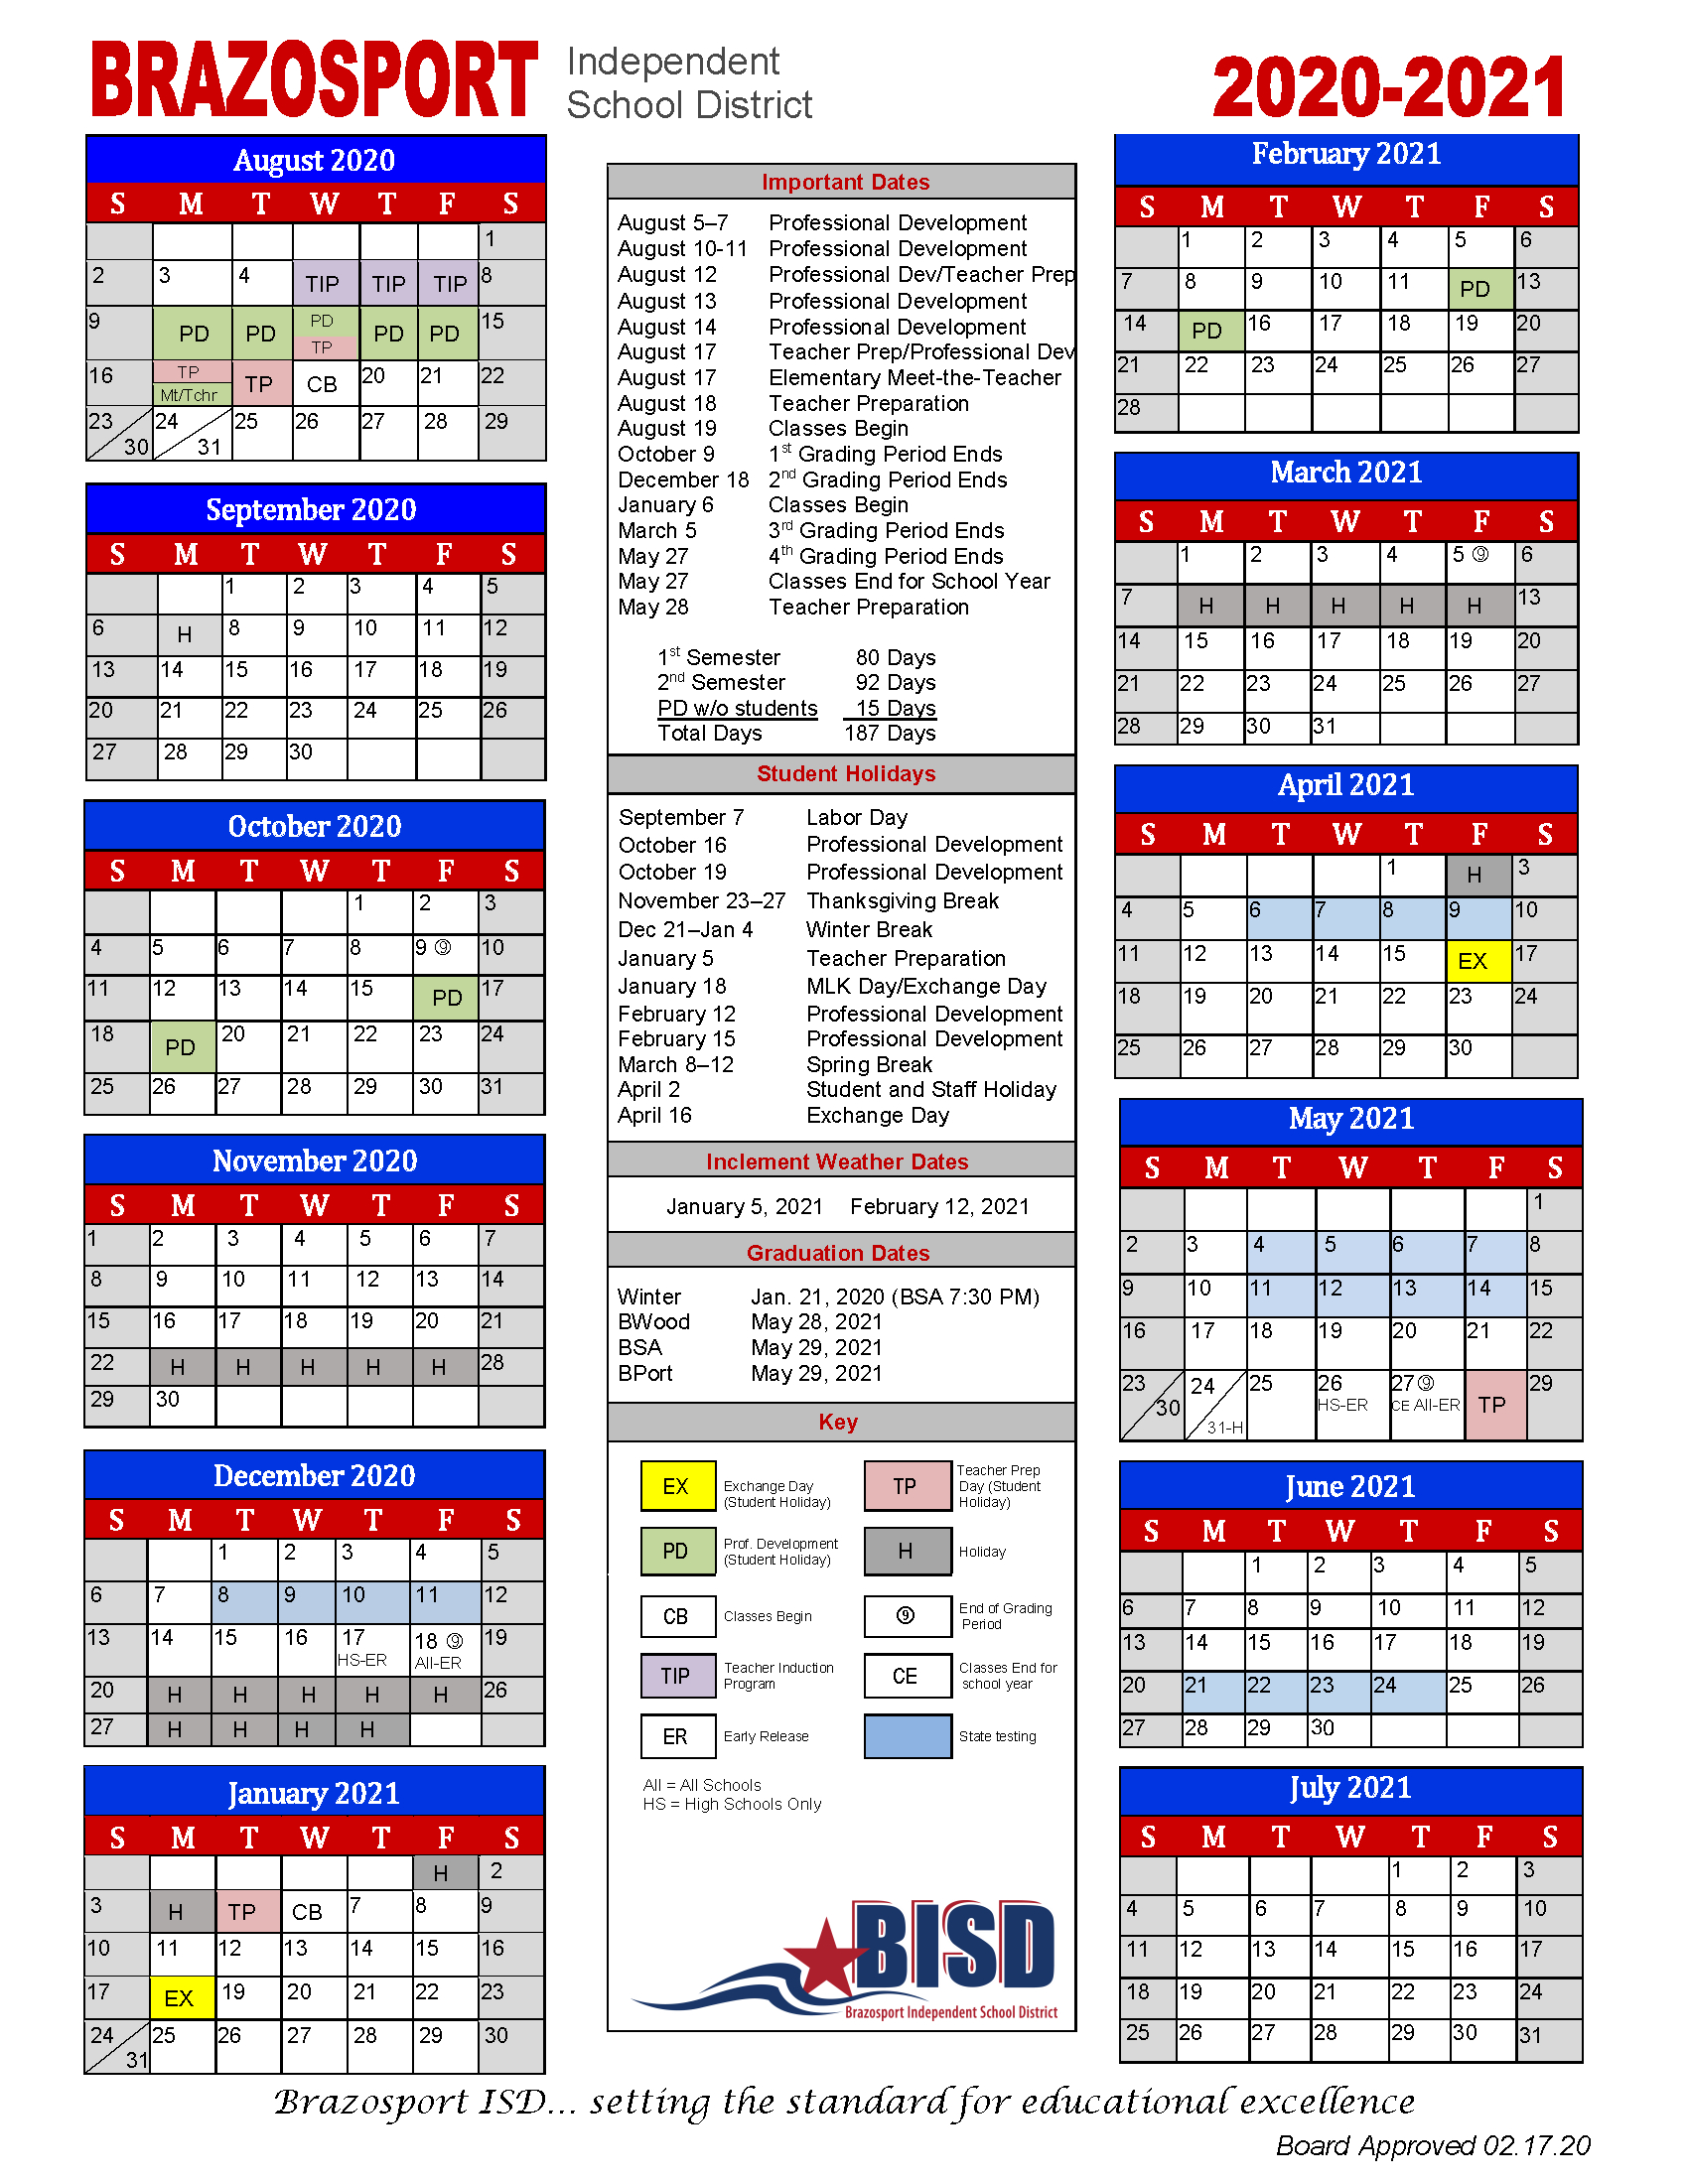 Board Approves 20202021 School Calendar  Brazosport regarding Sfasu School Calendar